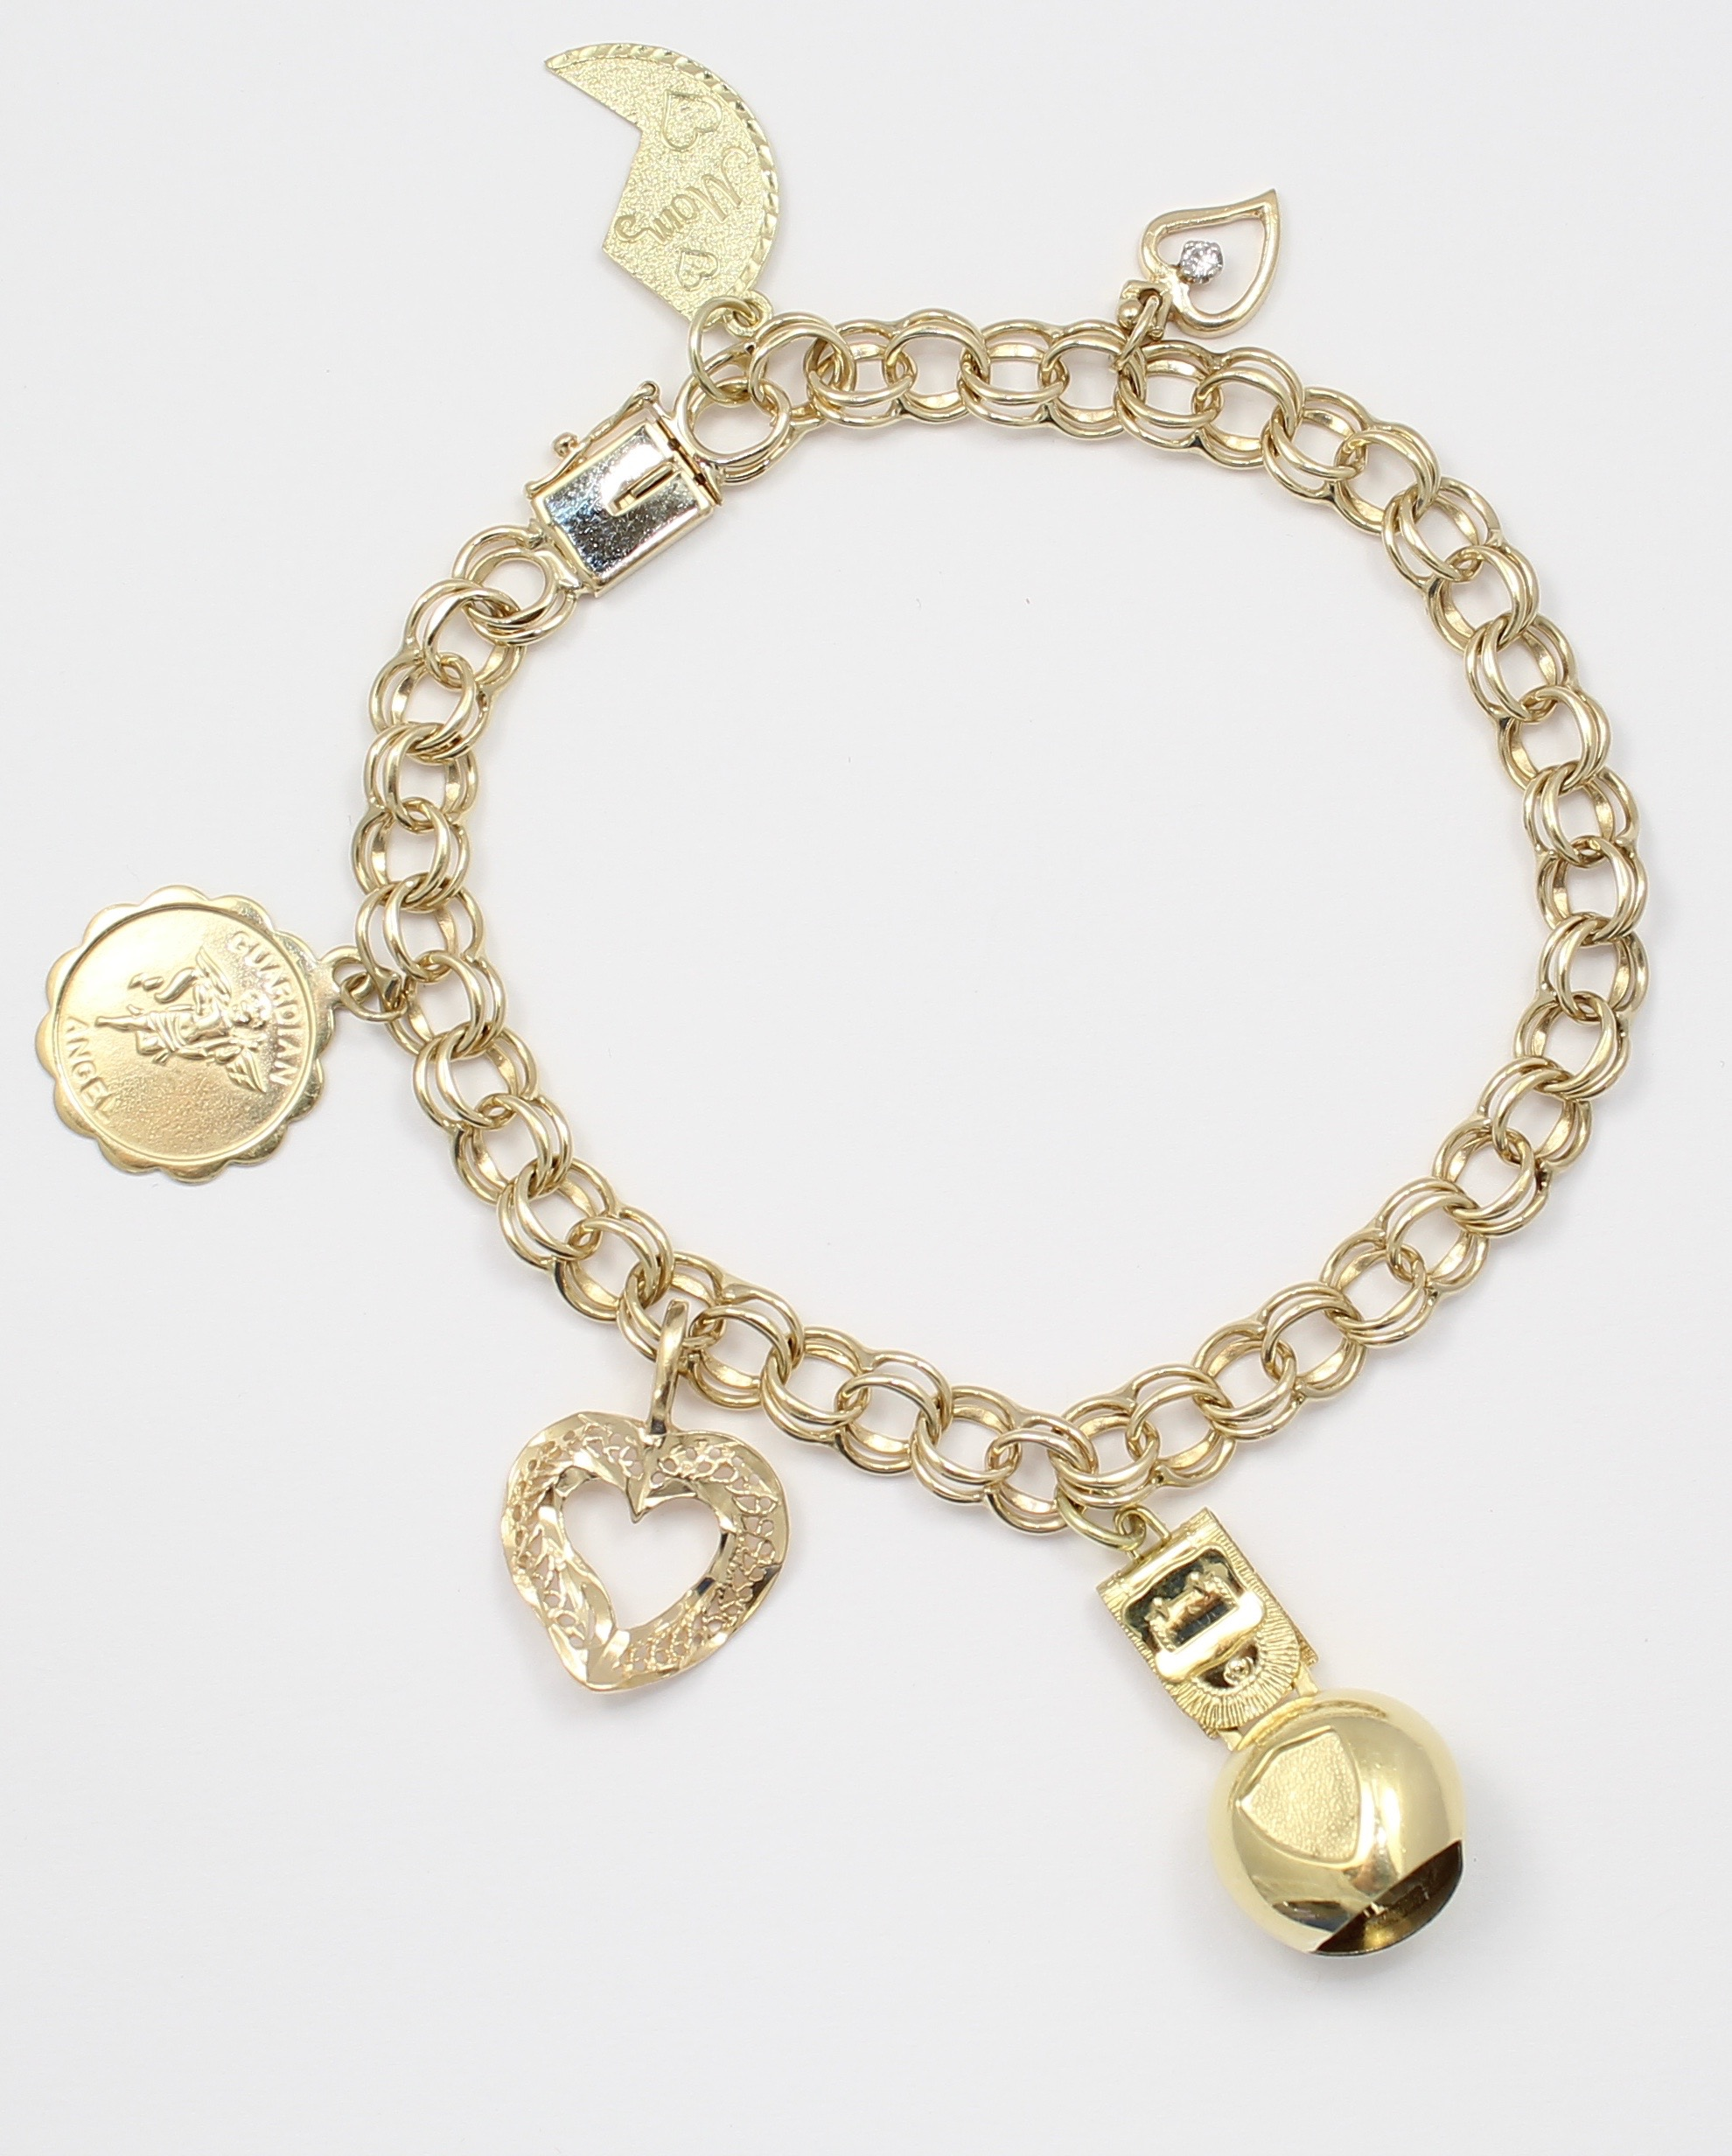 14k Yellow Gold Charm Bracelet With Charm Ladies Bracelet